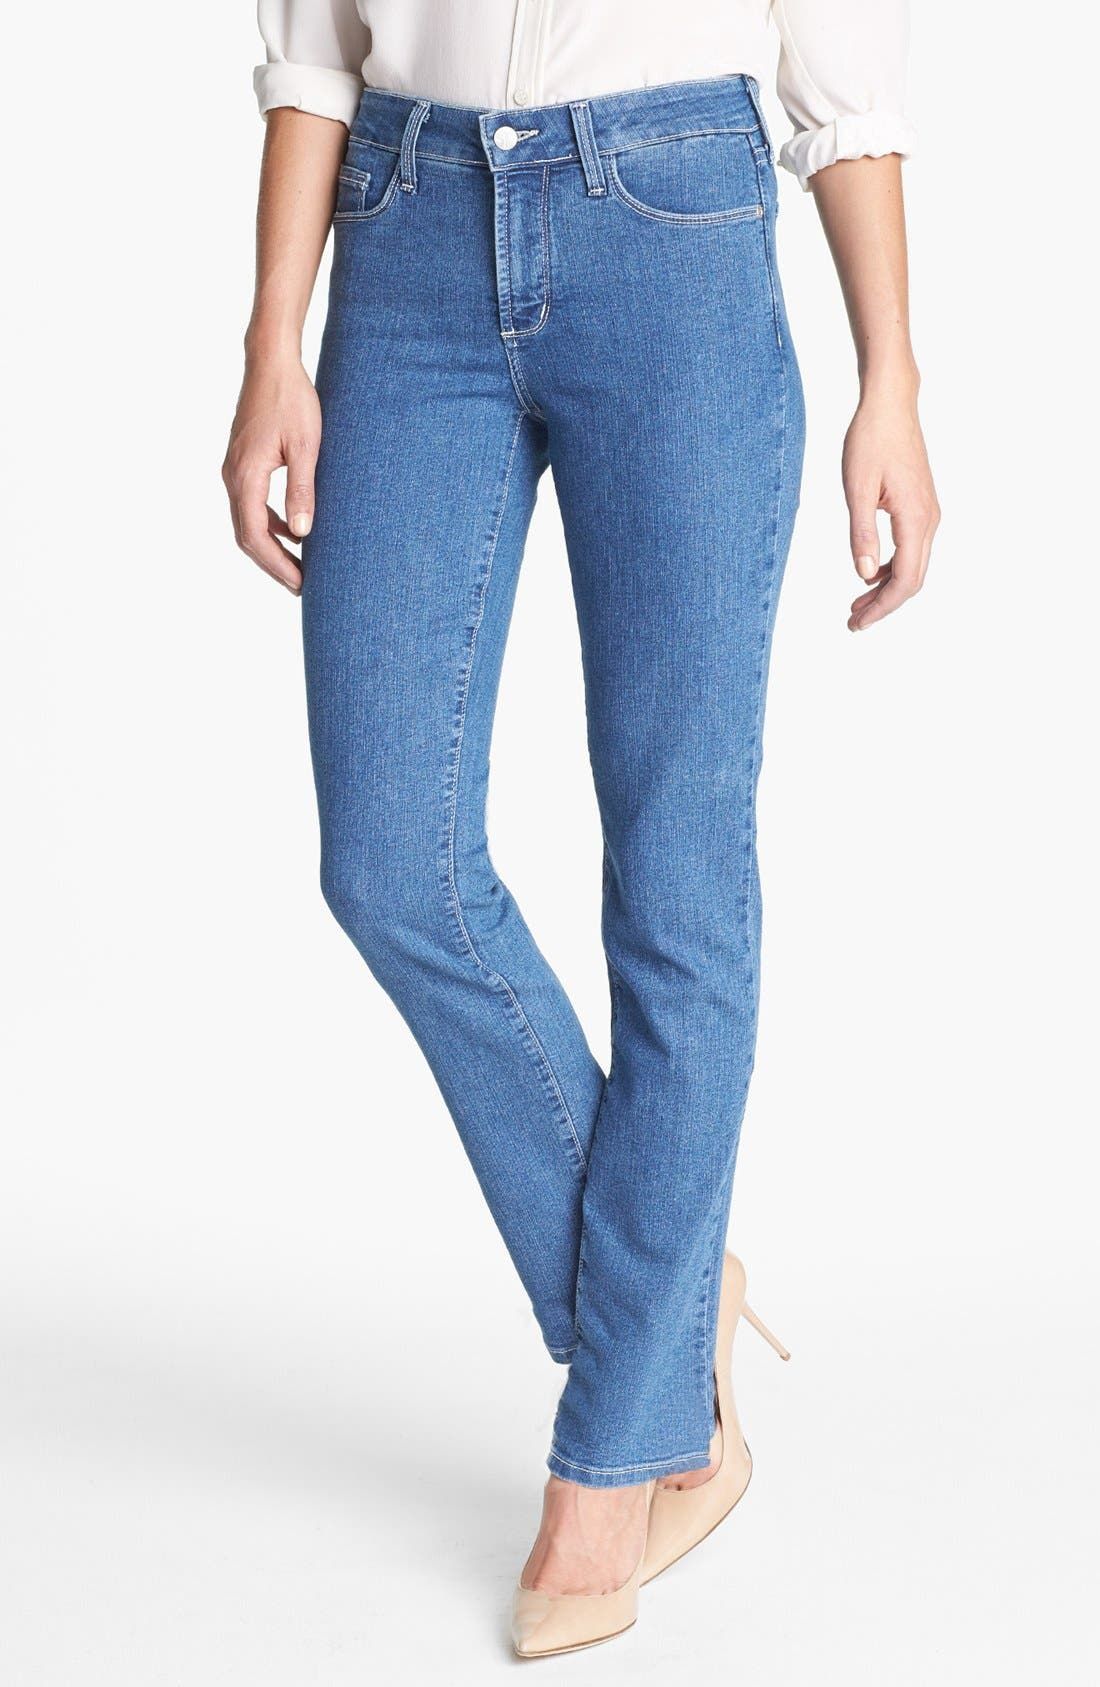 Main Image - NYDJ 'Sheri' Embellished Pocket Stretch Skinny Jeans (Maryland)